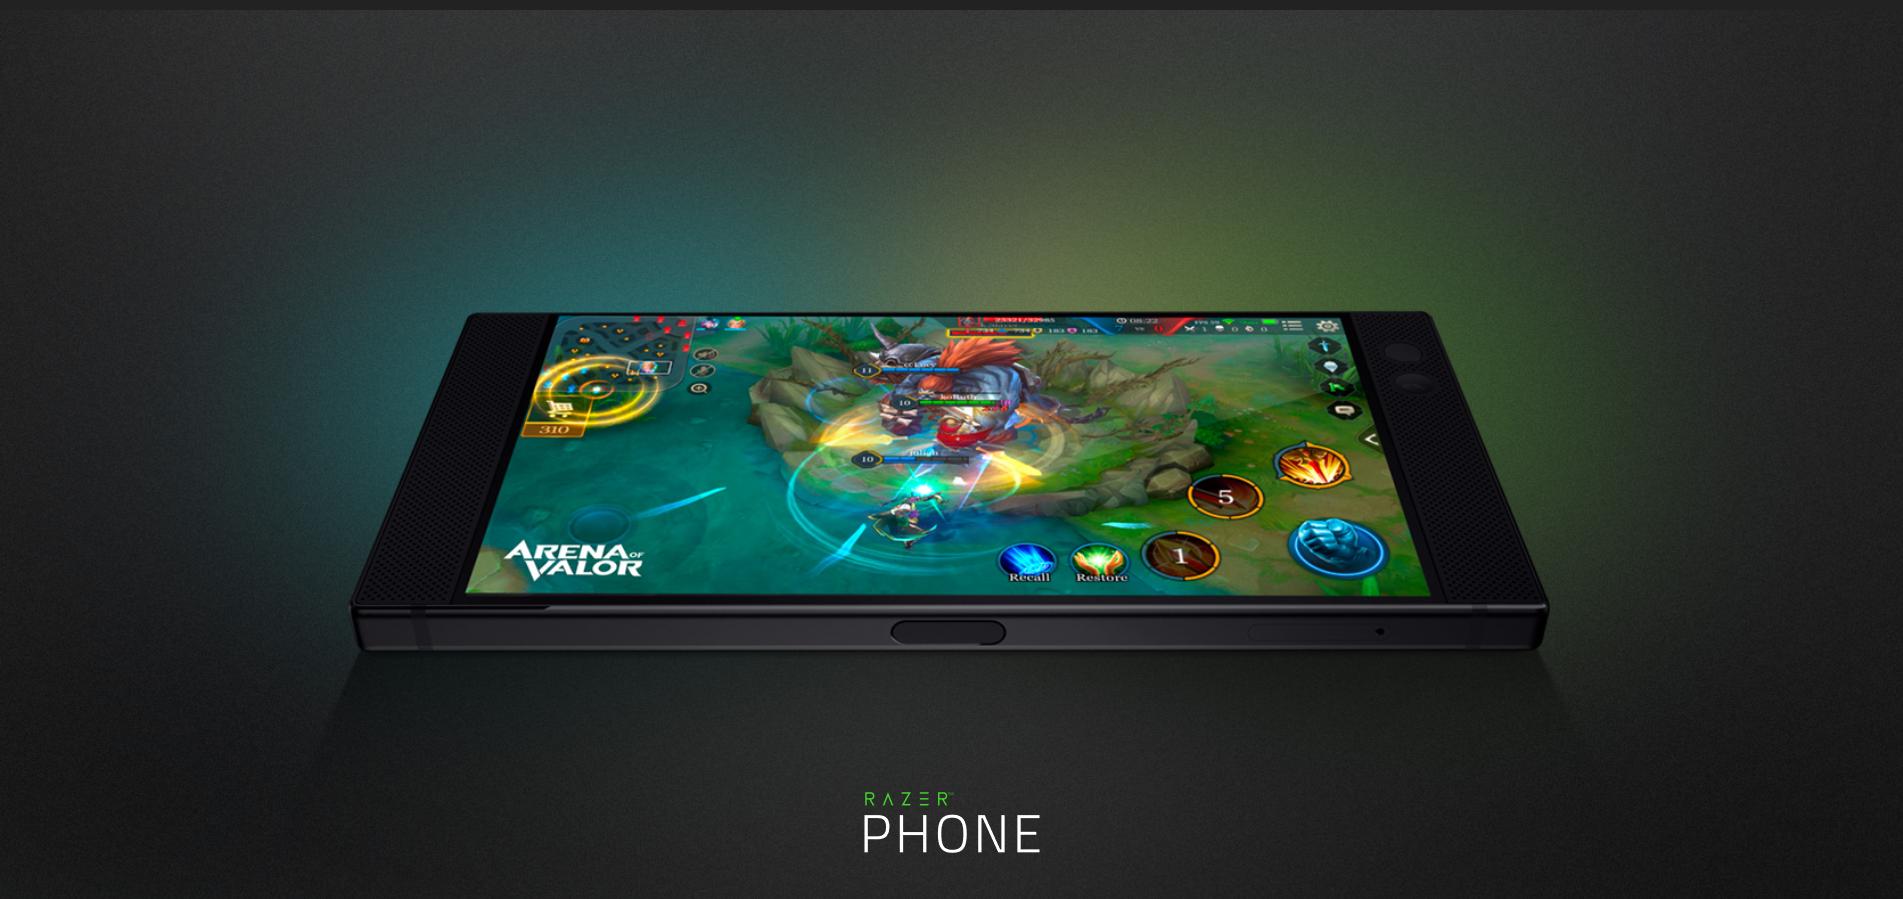 Screenshot-2017-11-1 Smartphone for Gamers - Razer Phone